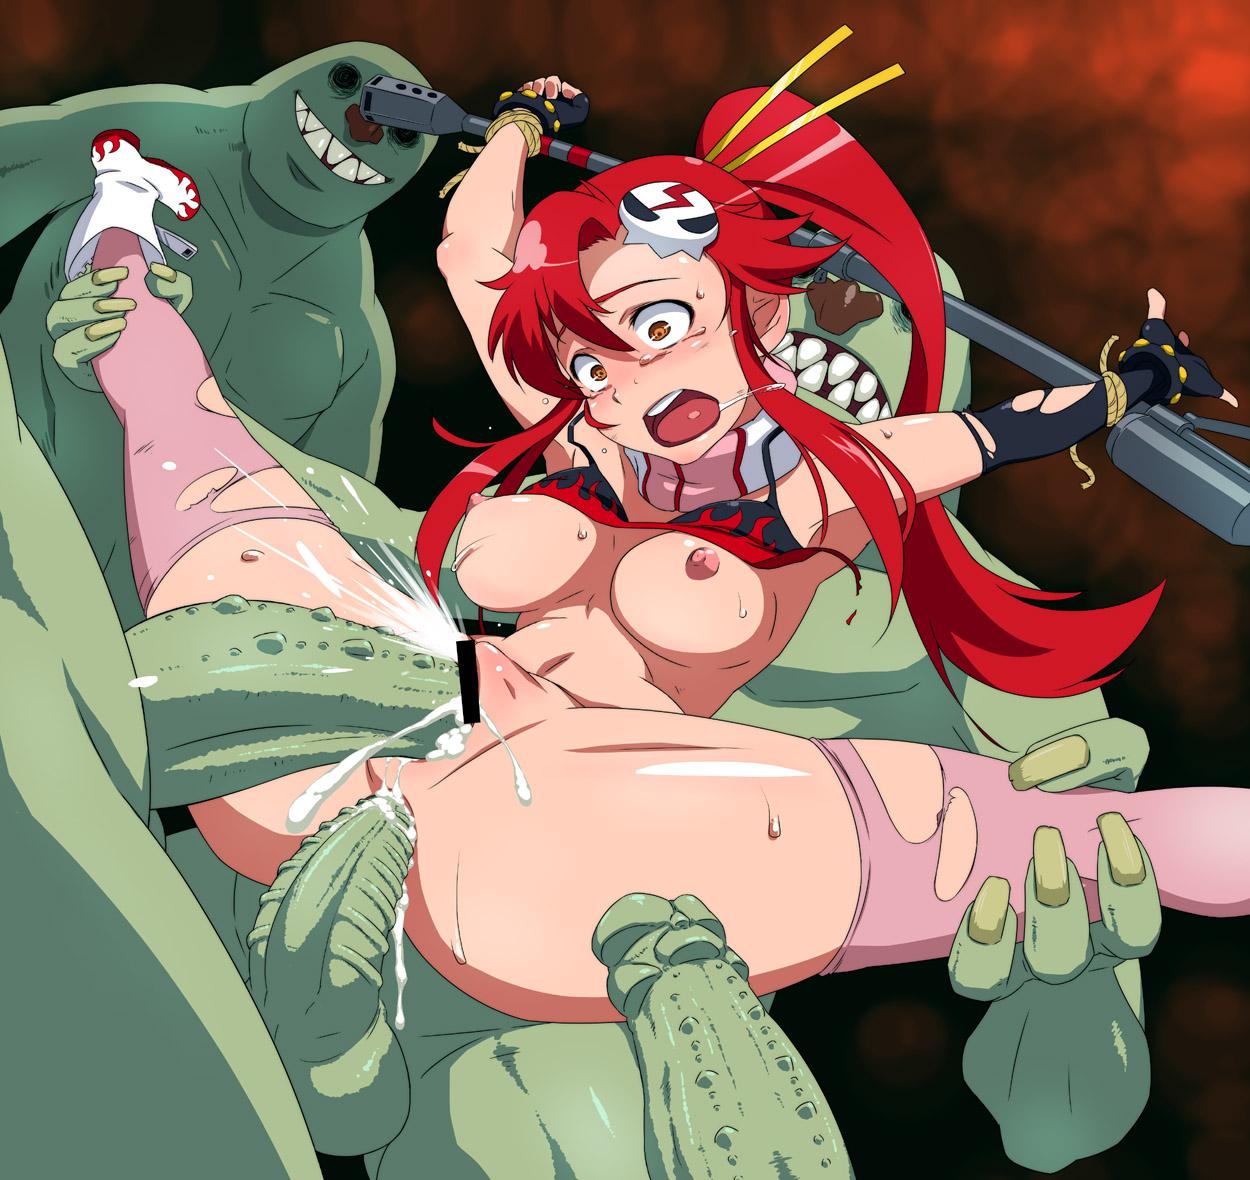 Yoko Litter naked with huge boobs and big butt from Gurren Lagreen ich